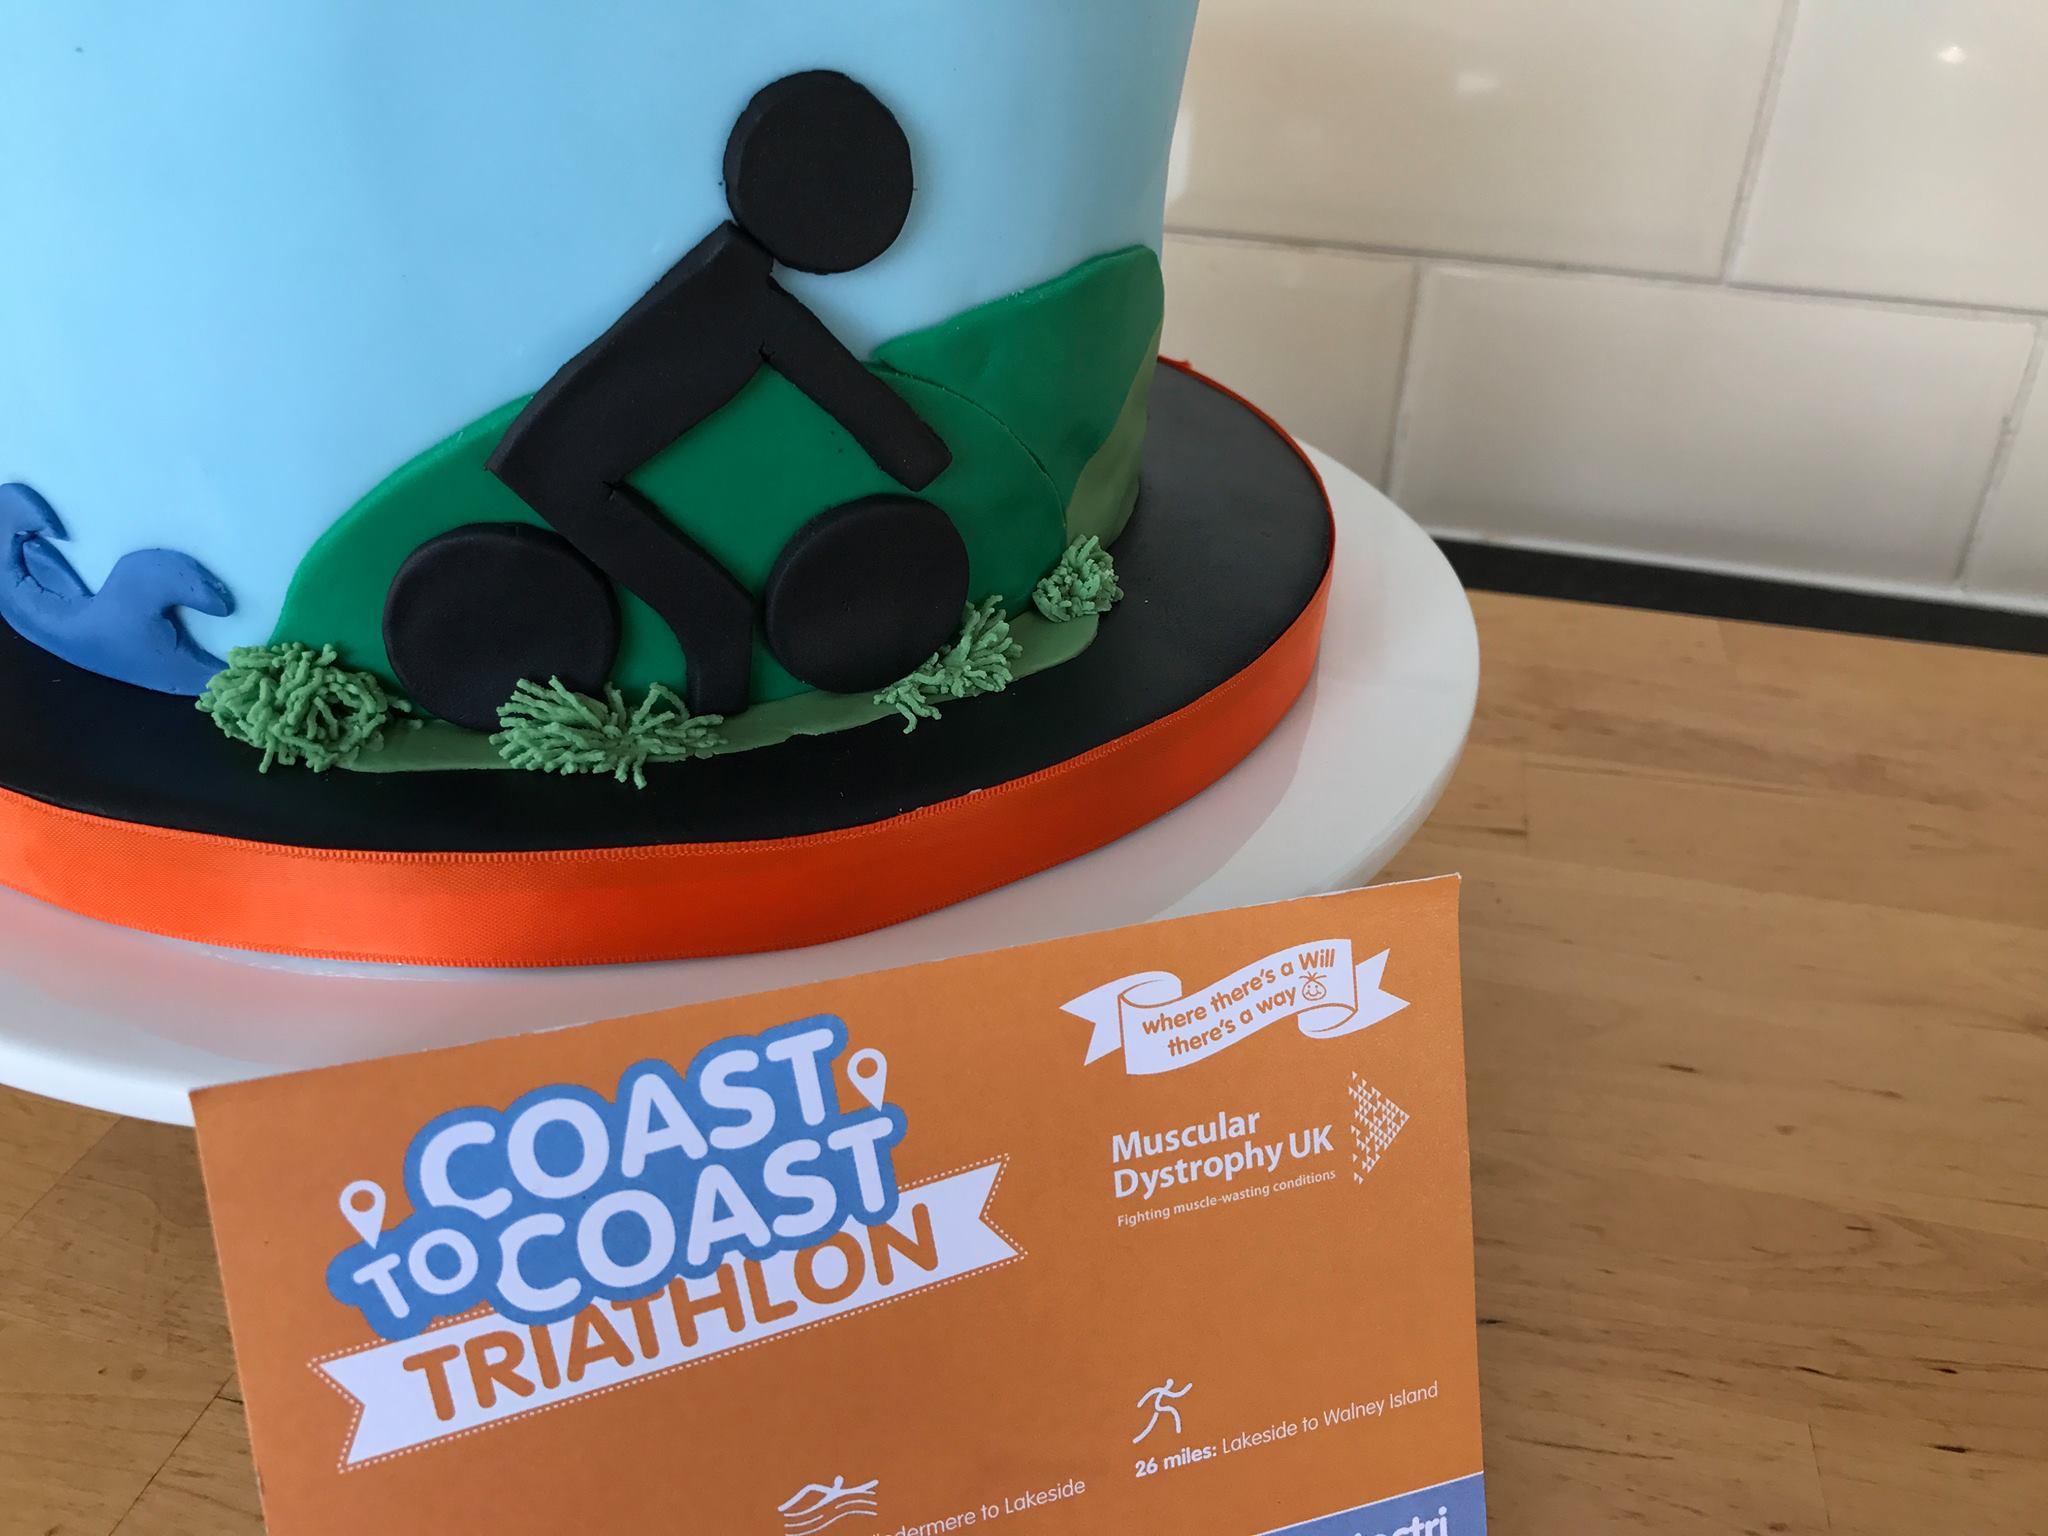 Coast to Coast Triathlon.